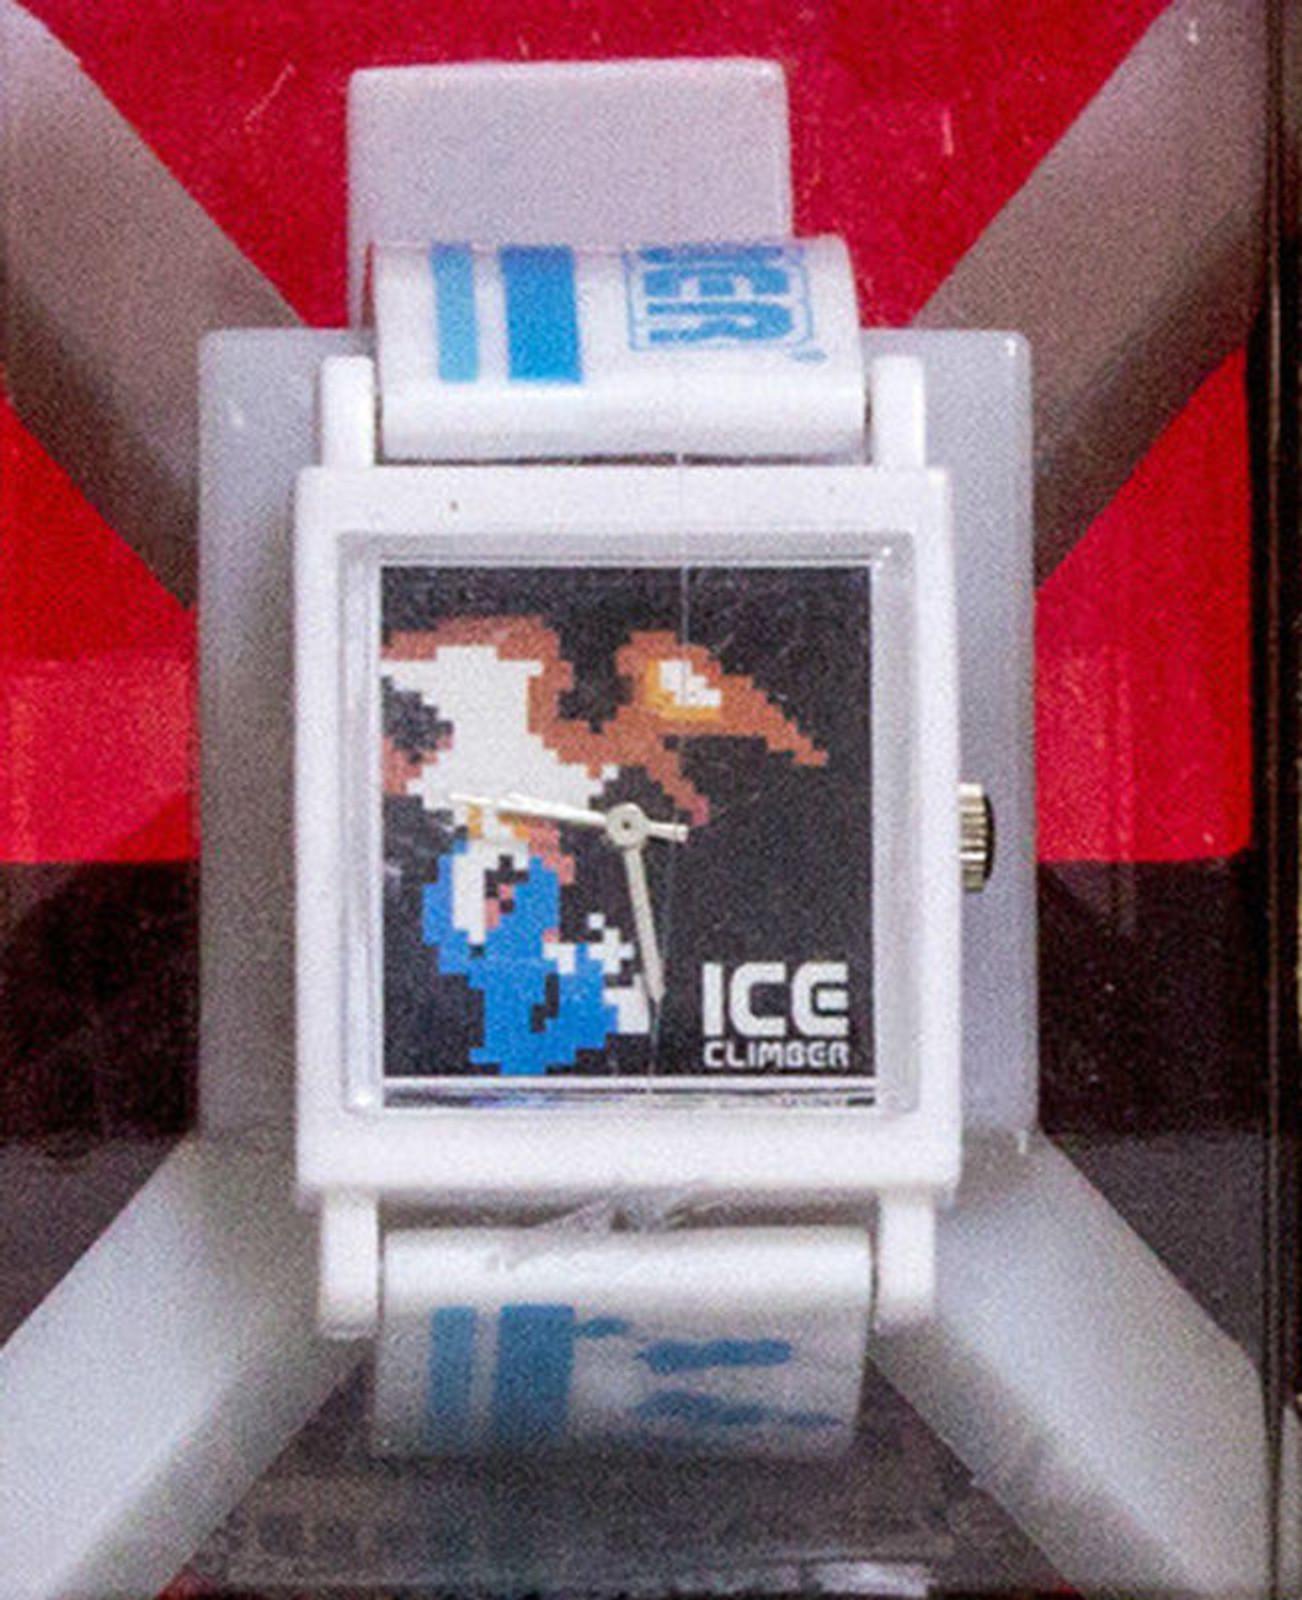 RARE!!! Nintendo Wristwatch In Cubecase Ice Climer Banpresto JAPAN GAME NES